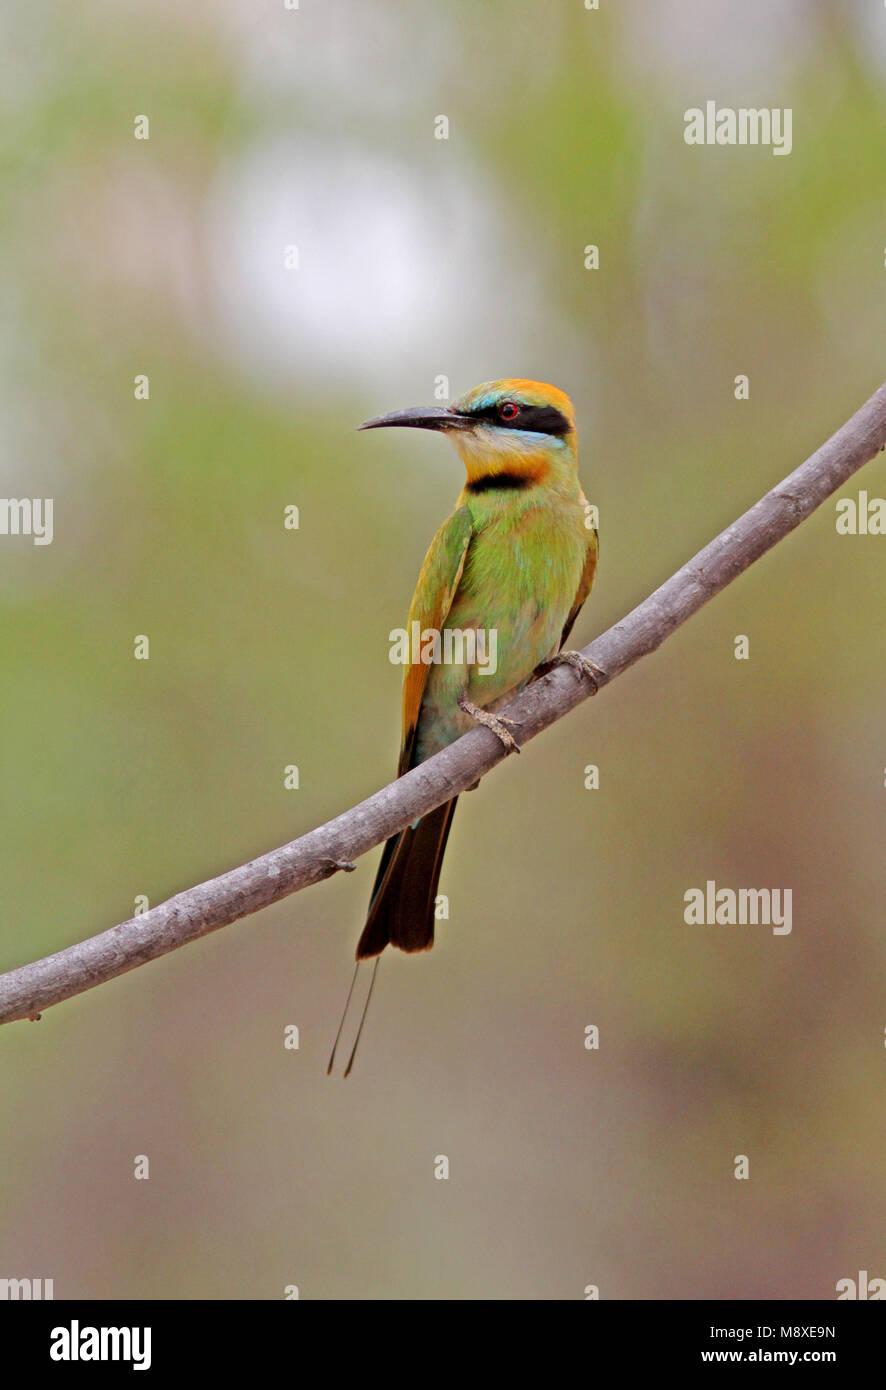 Regenboogbijeneter zittend op een tak, Rainbow Bee-eater perched on a branch - Stock Image